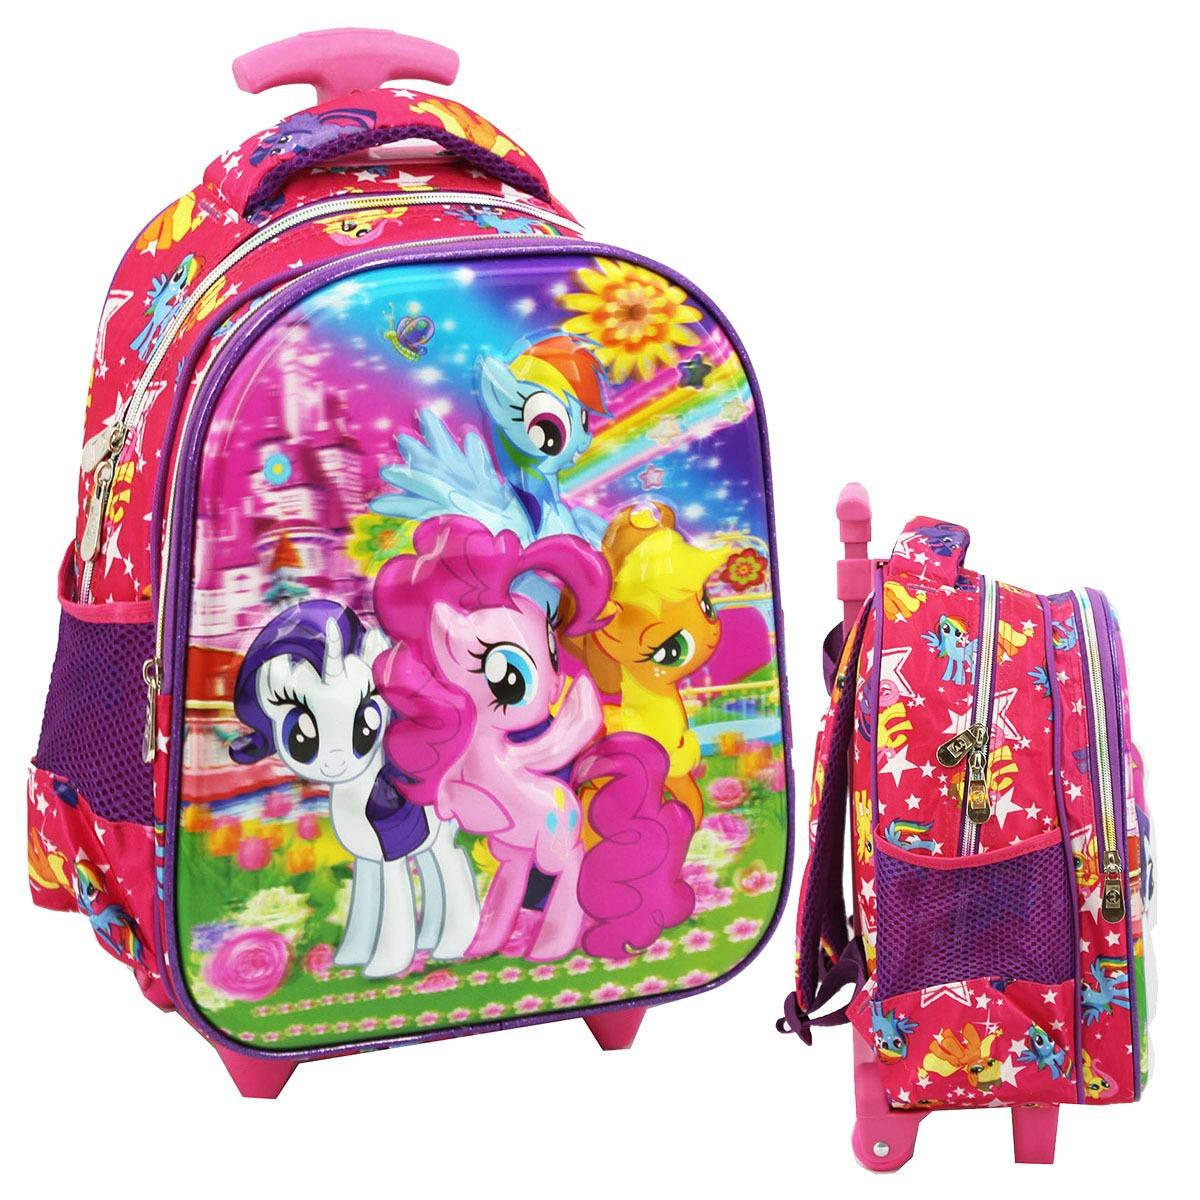 Jual Onlan My Little Pony 5D Timbul Hologram Tas Trolley Anak Sekolah Tk Import Ori